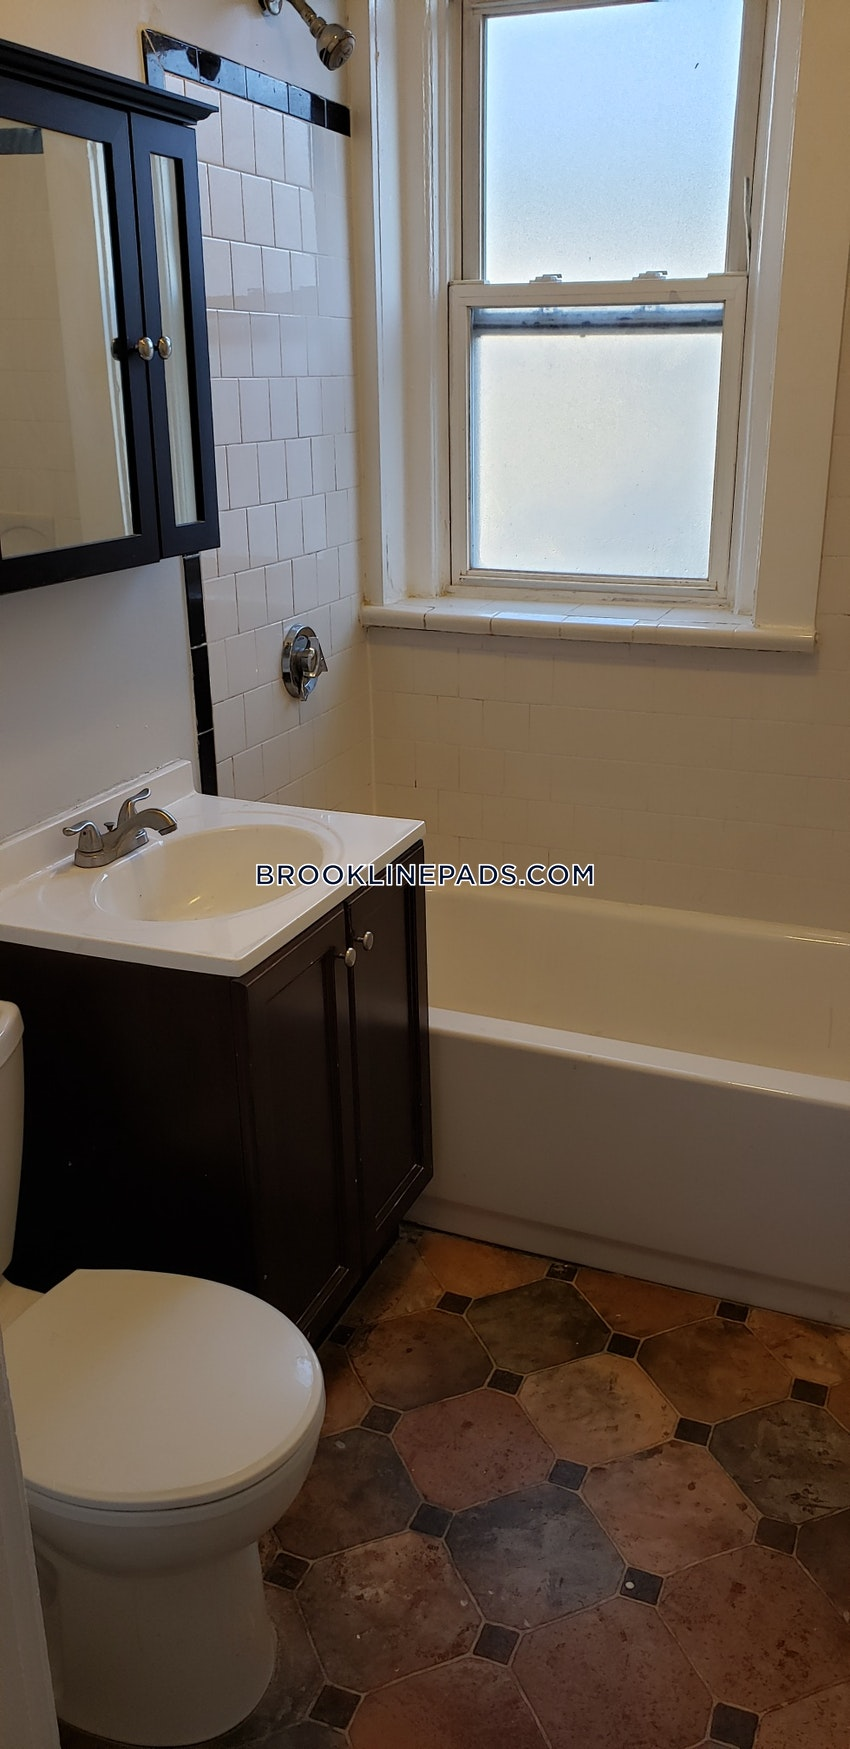 BROOKLINE- BOSTON UNIVERSITY - 4 Beds, 1.5 Baths - Image 23